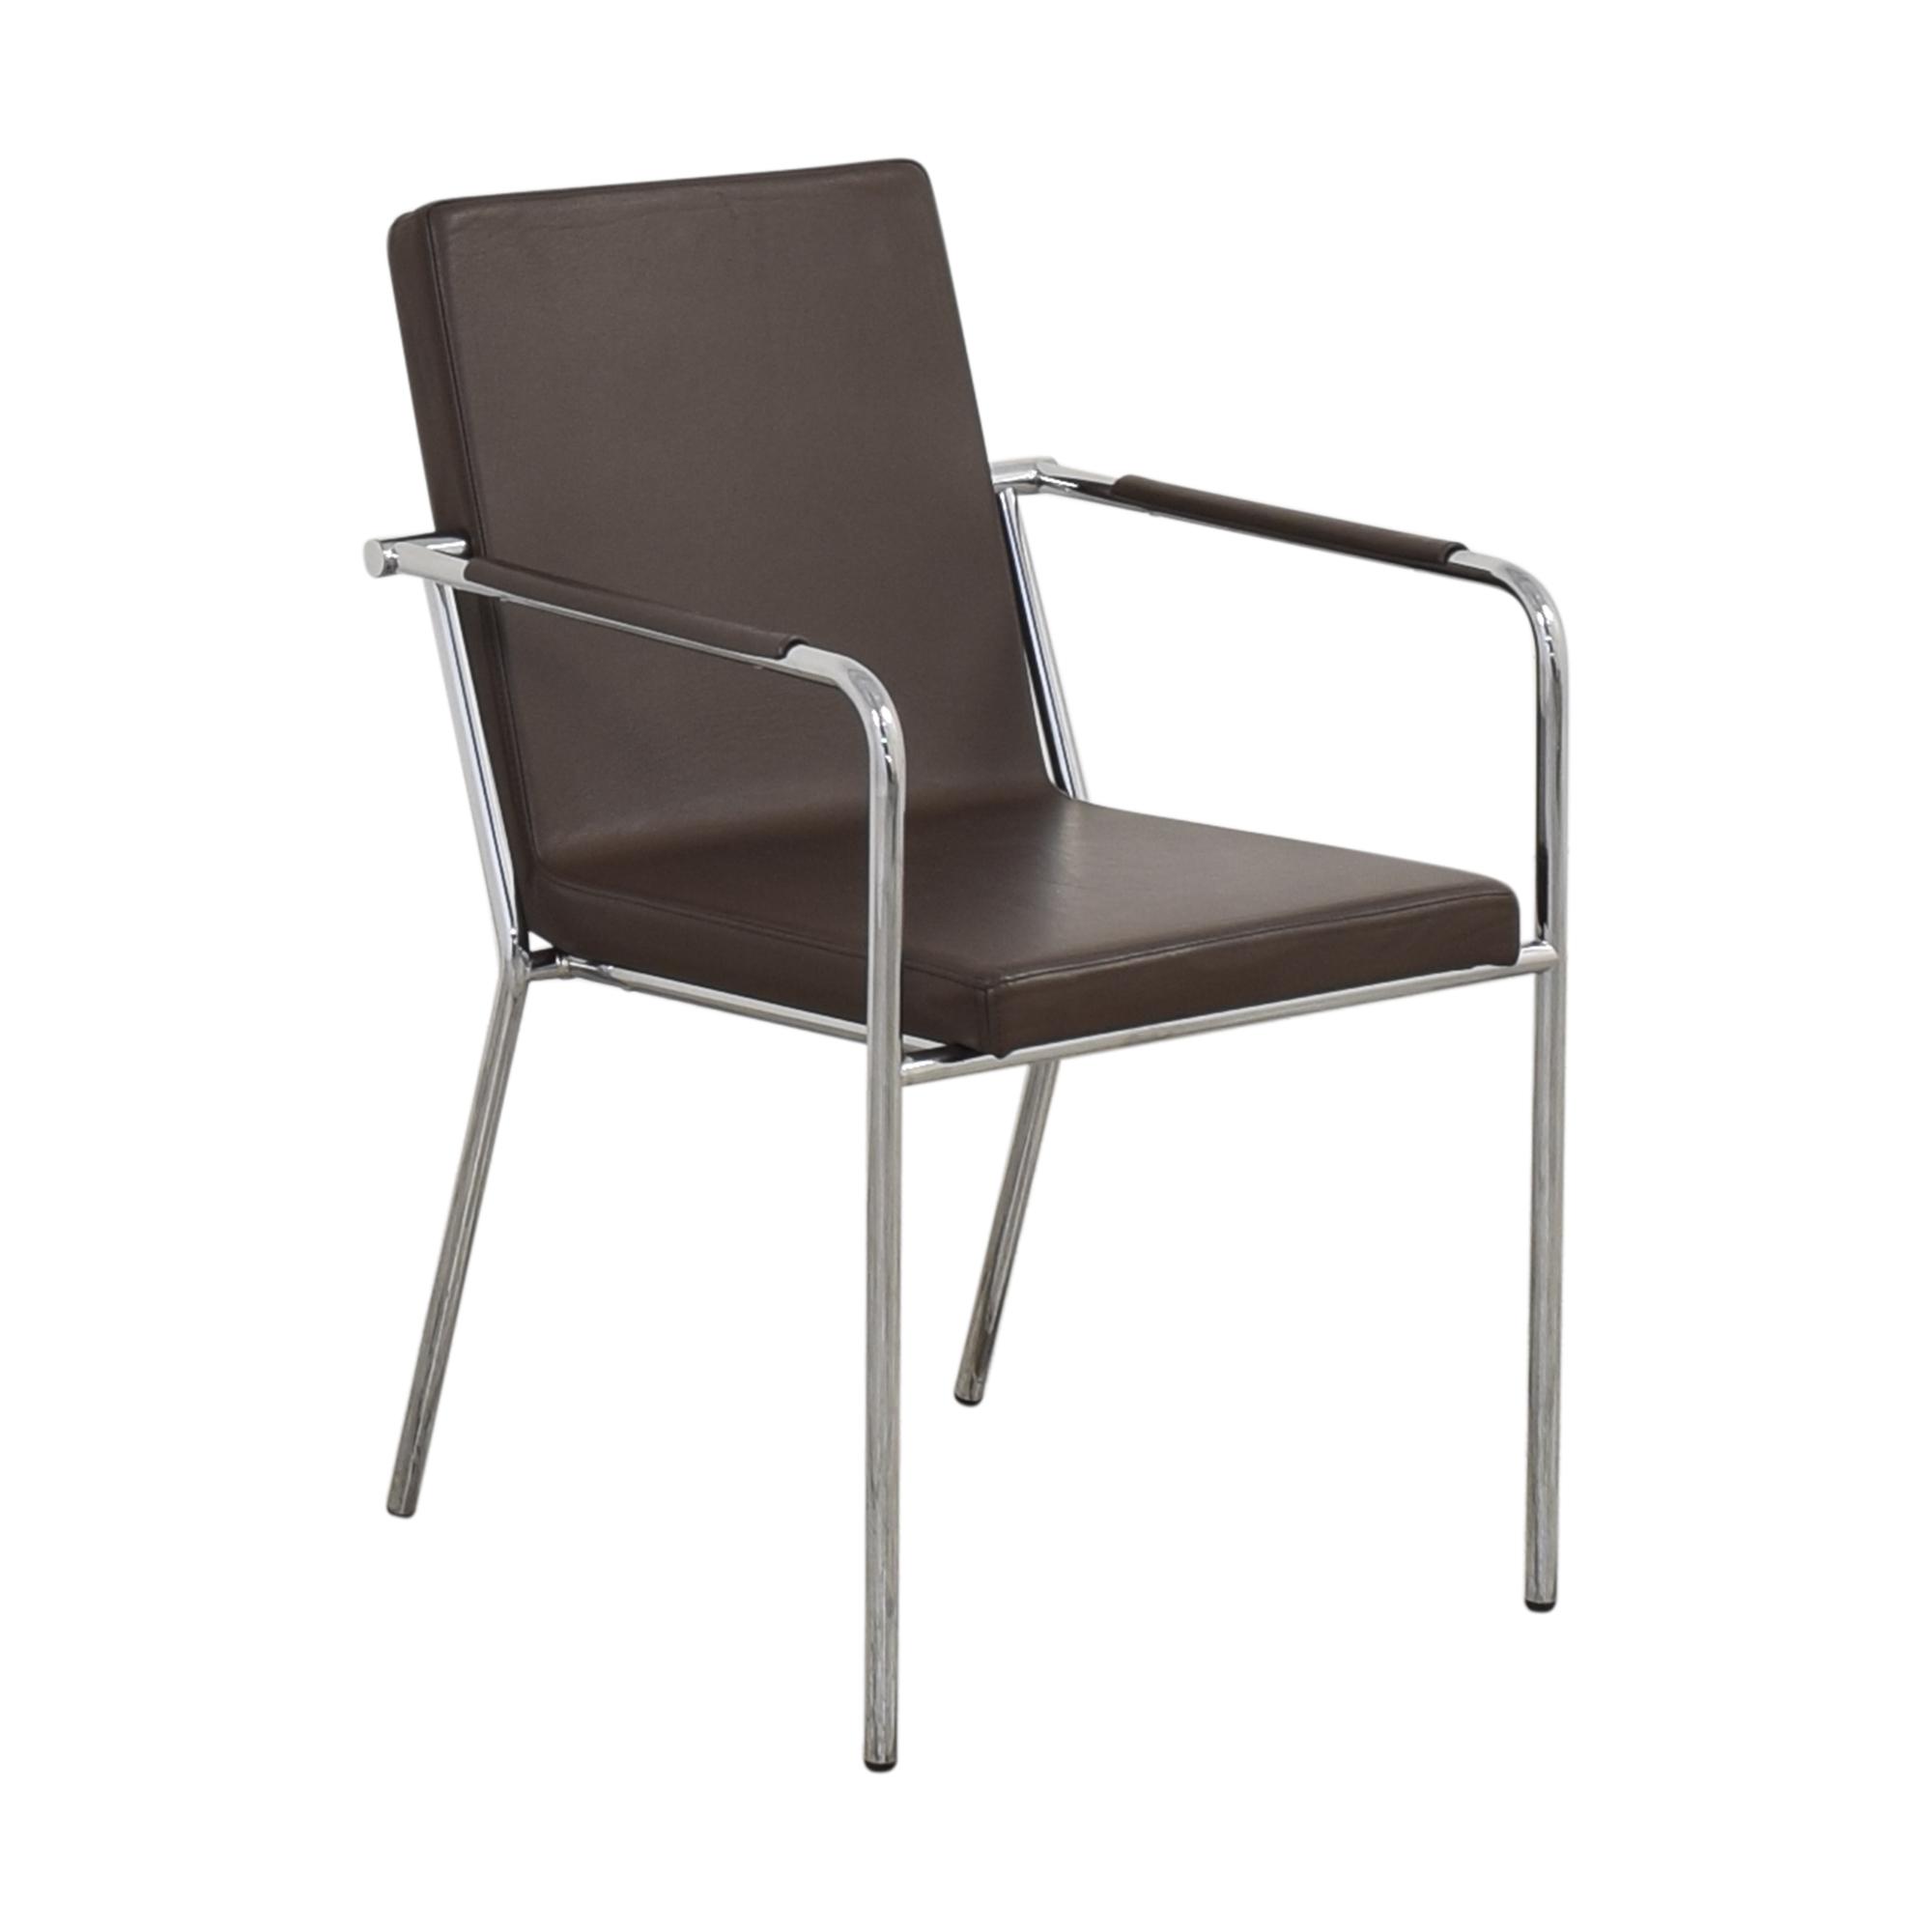 Malik Malik Portsmouth Stackable Armchair for sale